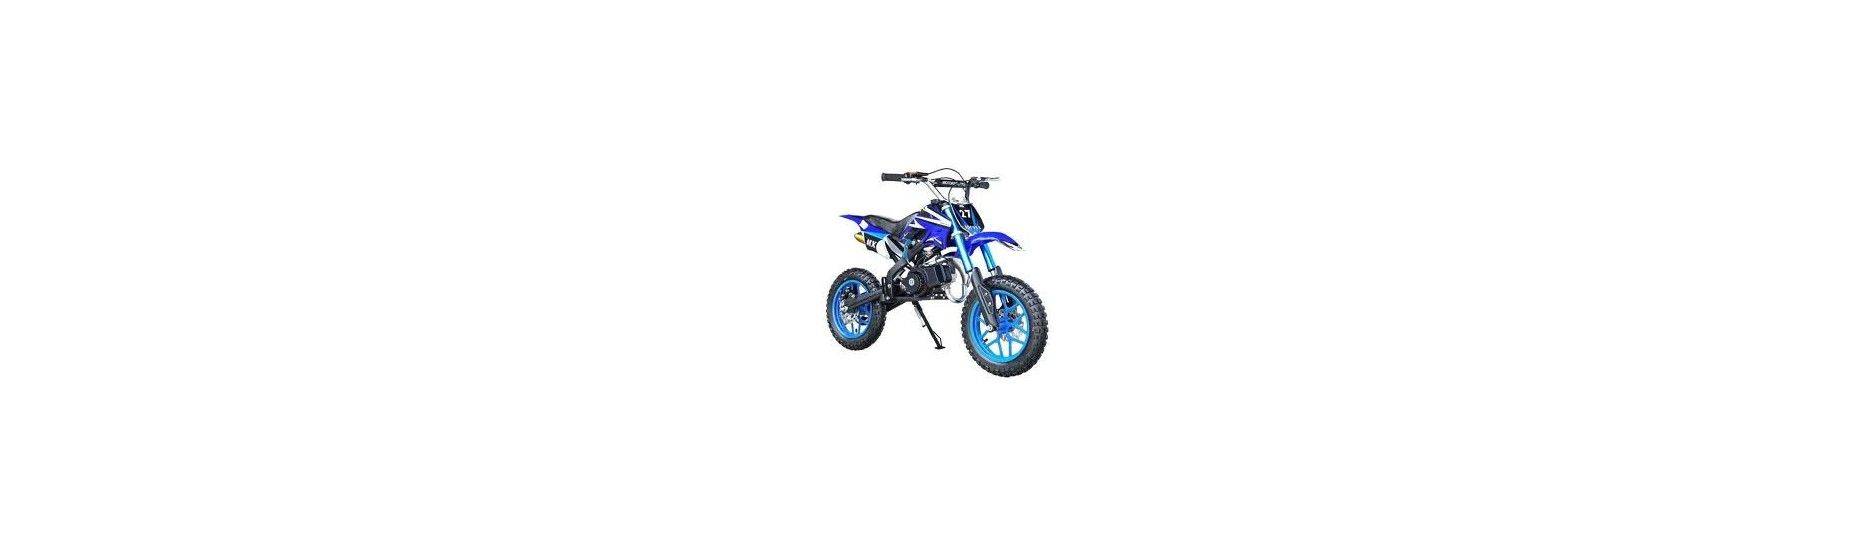 Minikros minicross, minibike